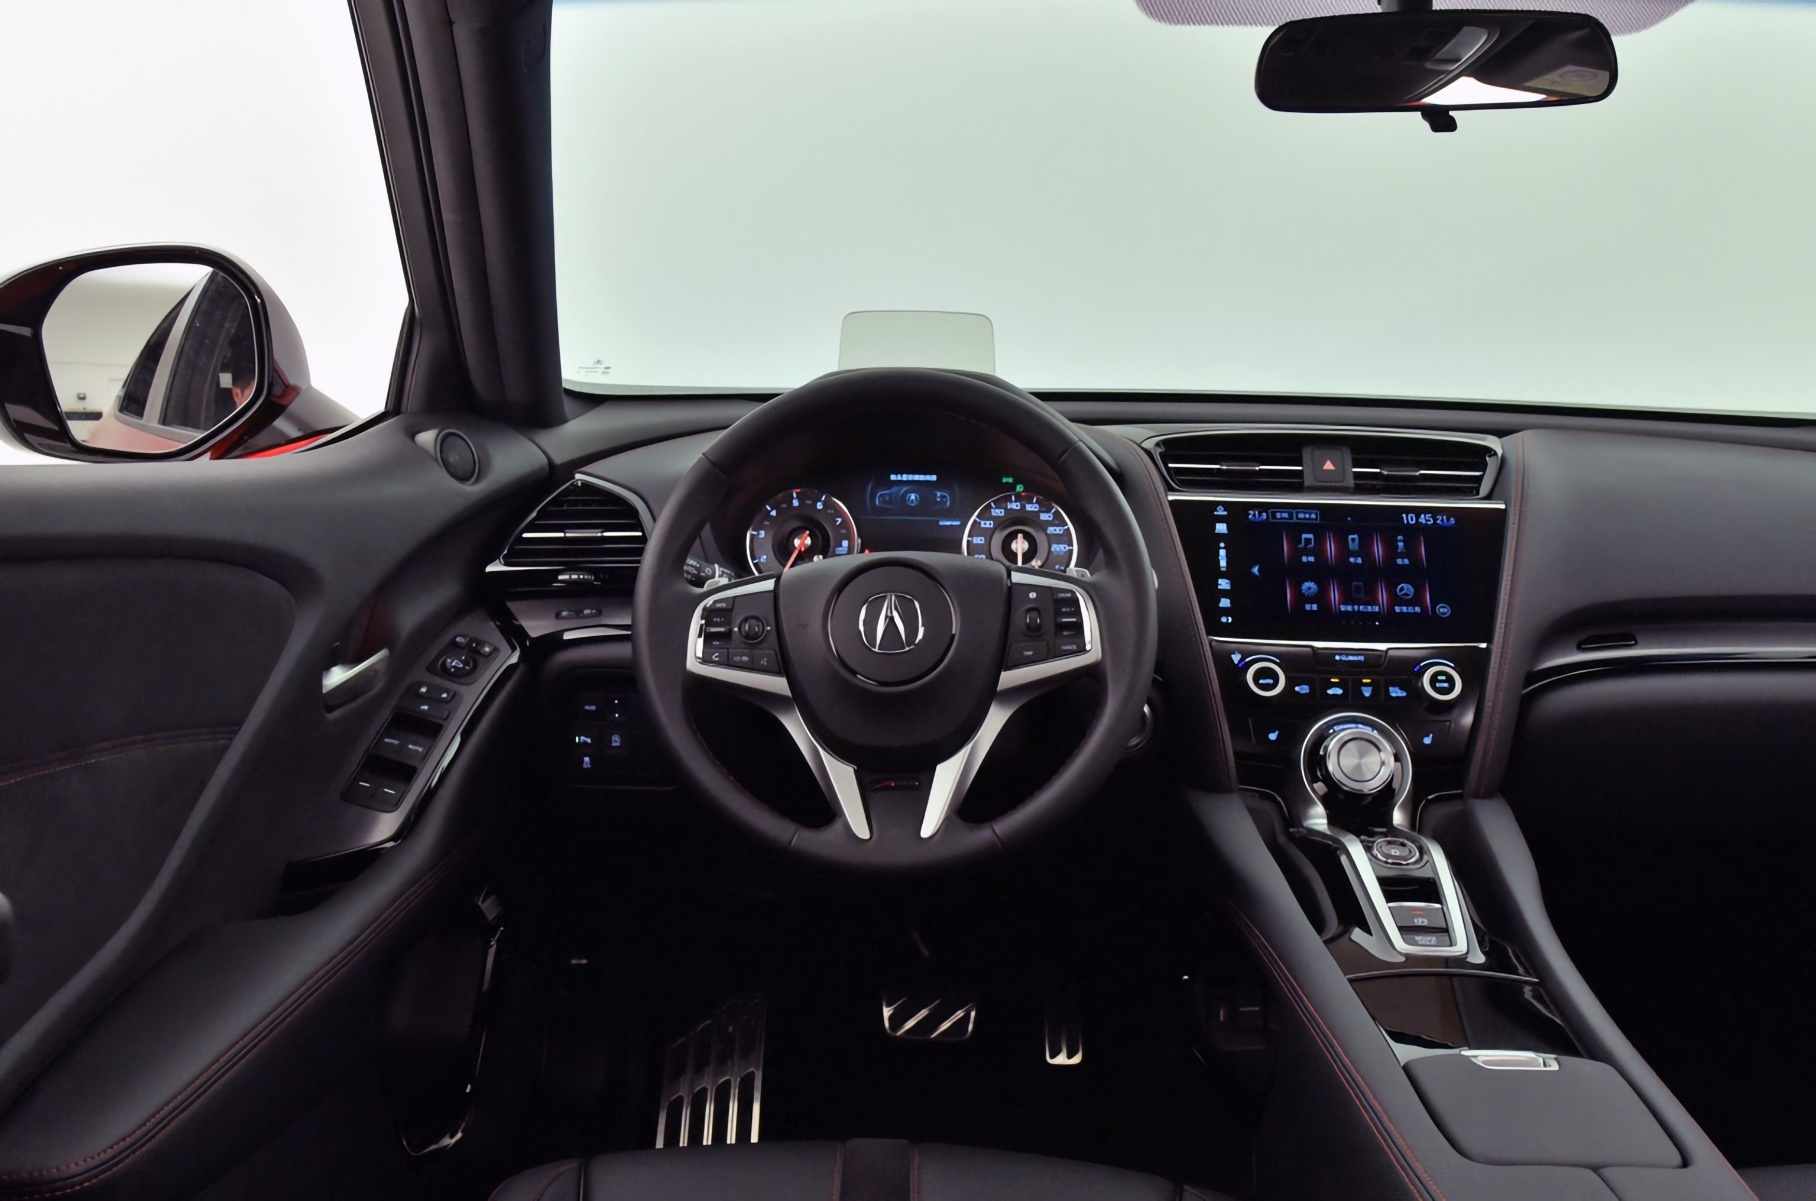 Acura обновила маленький кроссовер CDX